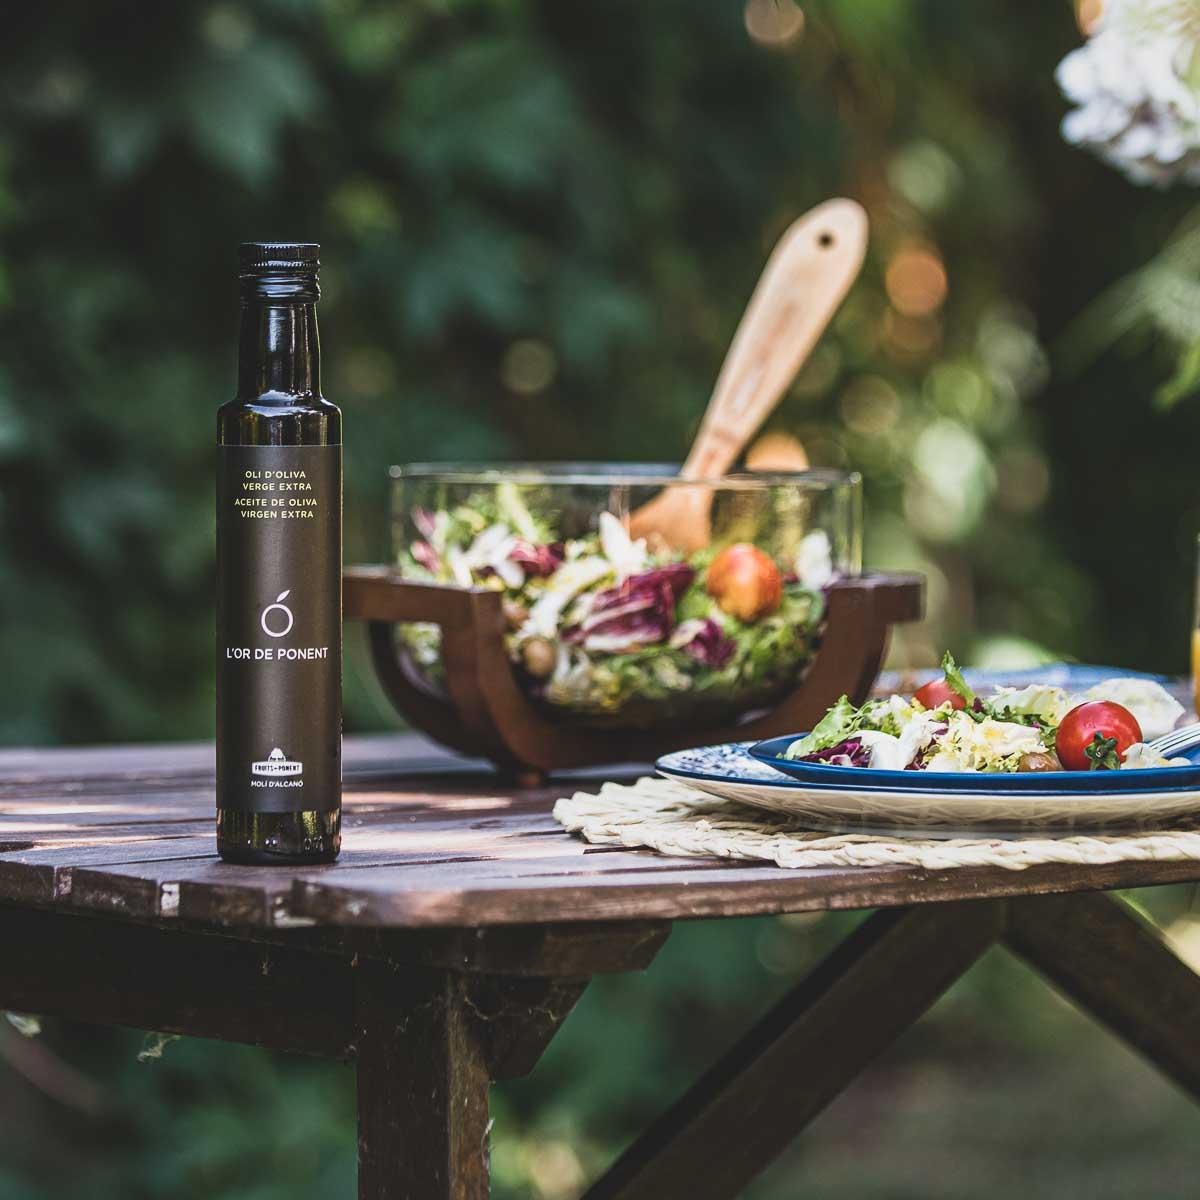 250 ml -Or-de-Ponent-aove-aceite-oliva-virgen-extra-garrigues-denominacion-origen-2